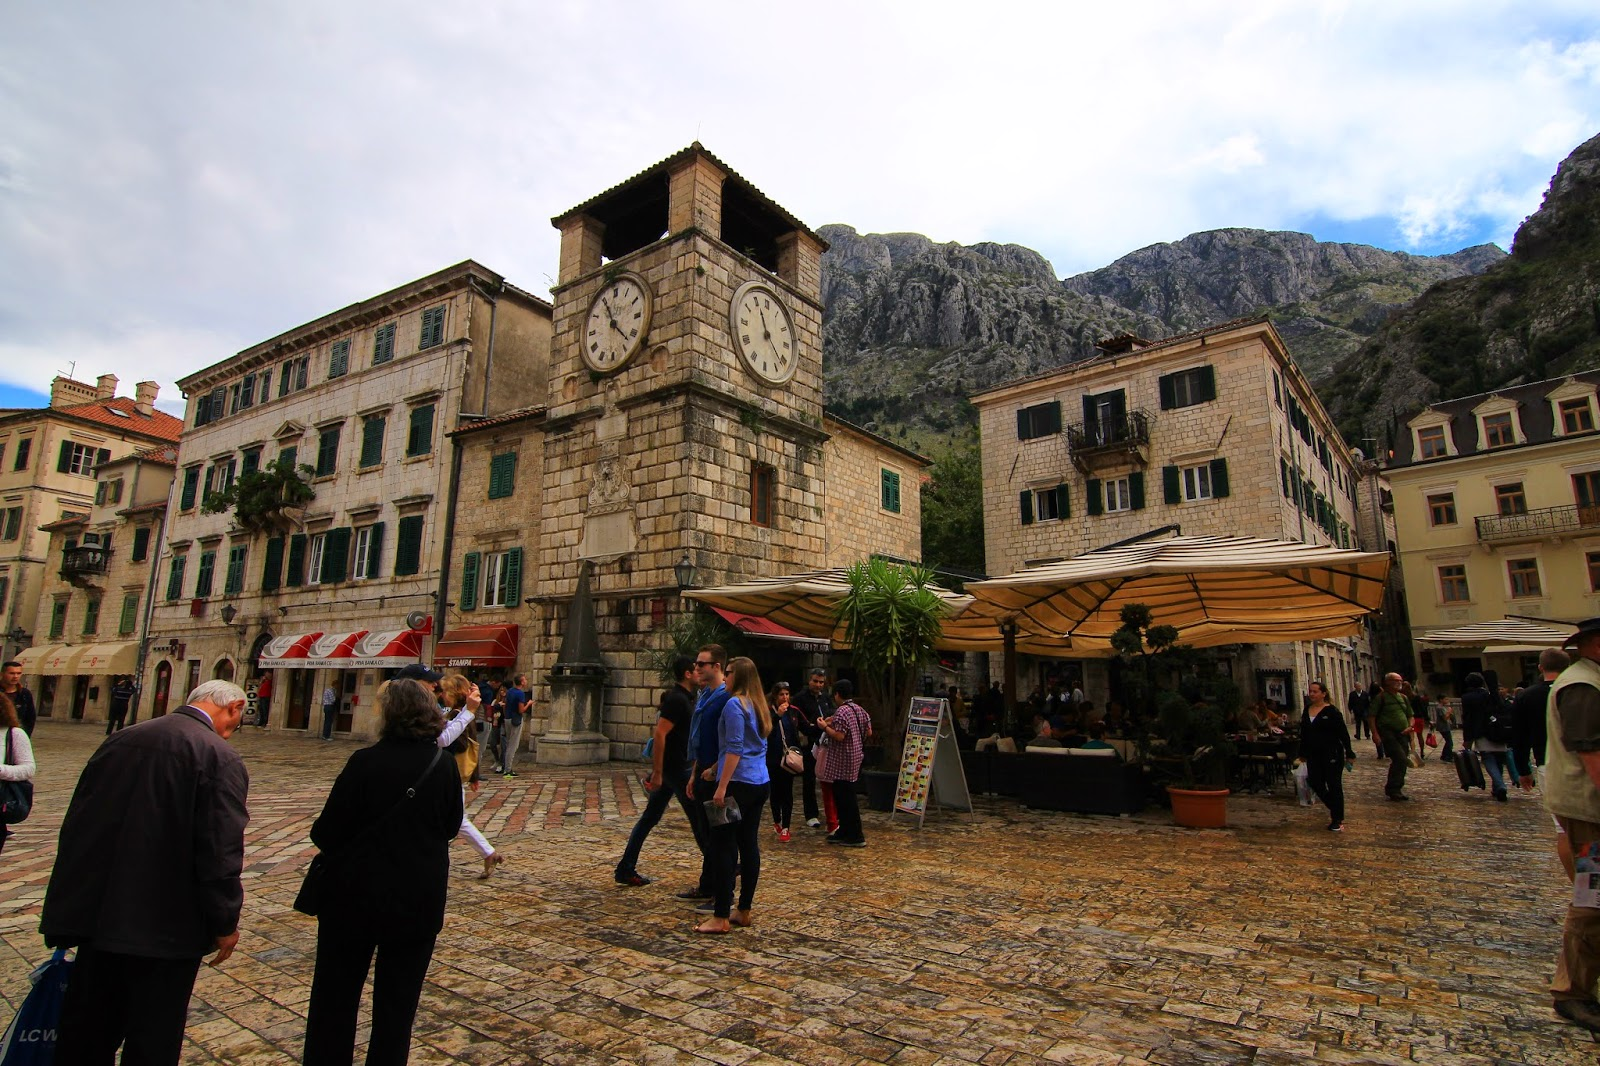 Kotor old town (科托古城)